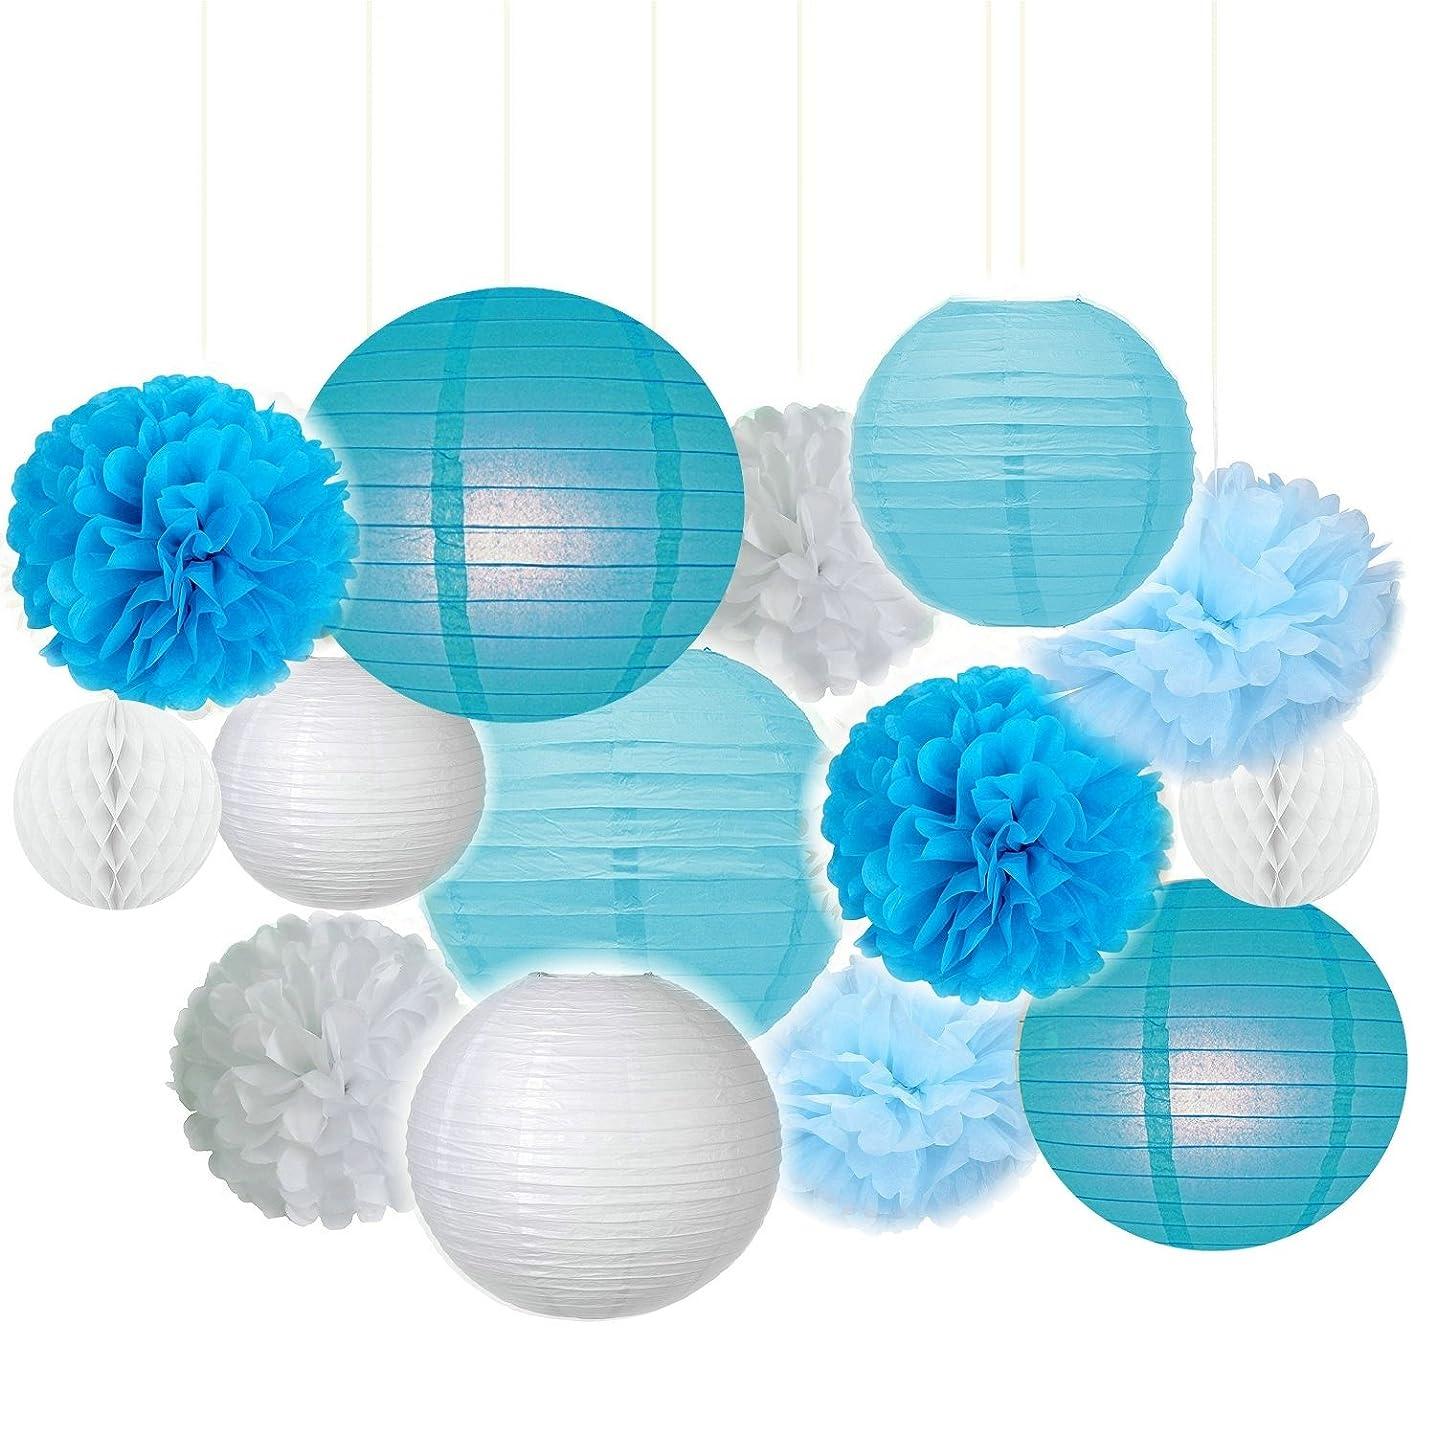 Fascola 14ps Blue&White Party Decor Background Wall Wedding Theme Tissue Paper Pom Pom Tassel Garland Polka Dot Tissue Poms Paper Garland for Wedding Baby Shower Decoration Bridal Shower Blue Birthday